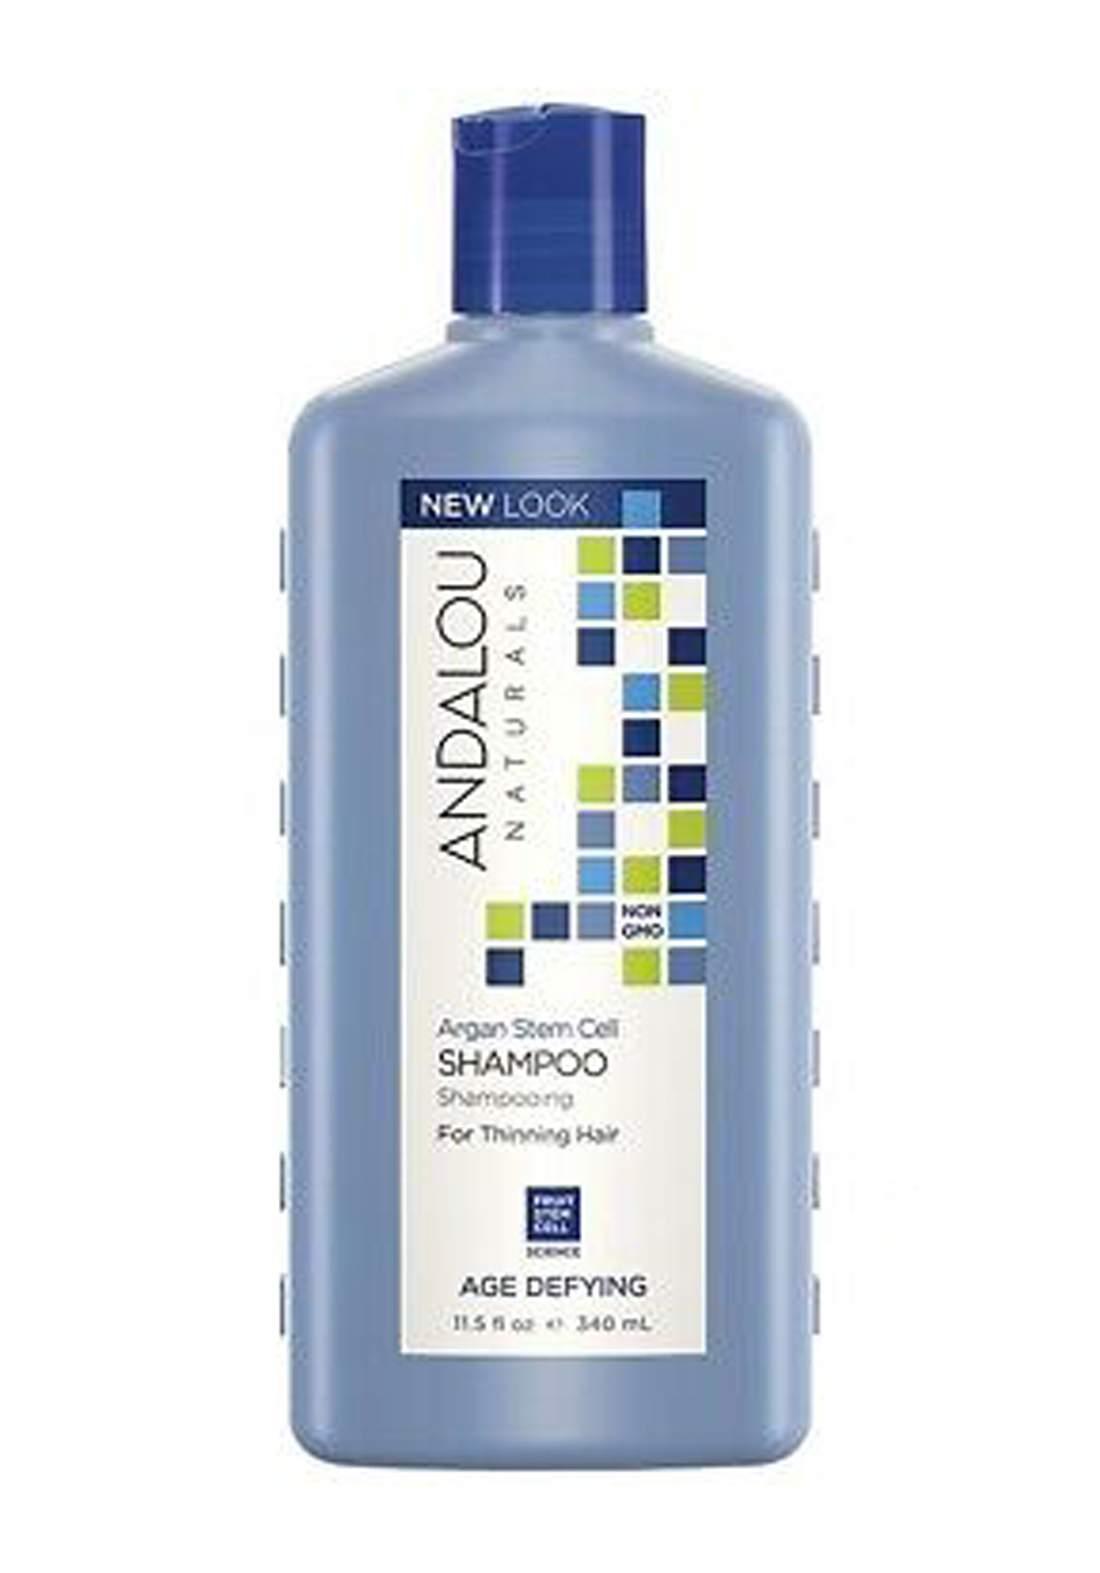 27300 Andalou Naturals Age Defying Shampoo Argen Stem Cells 340ml شامبو للشعر